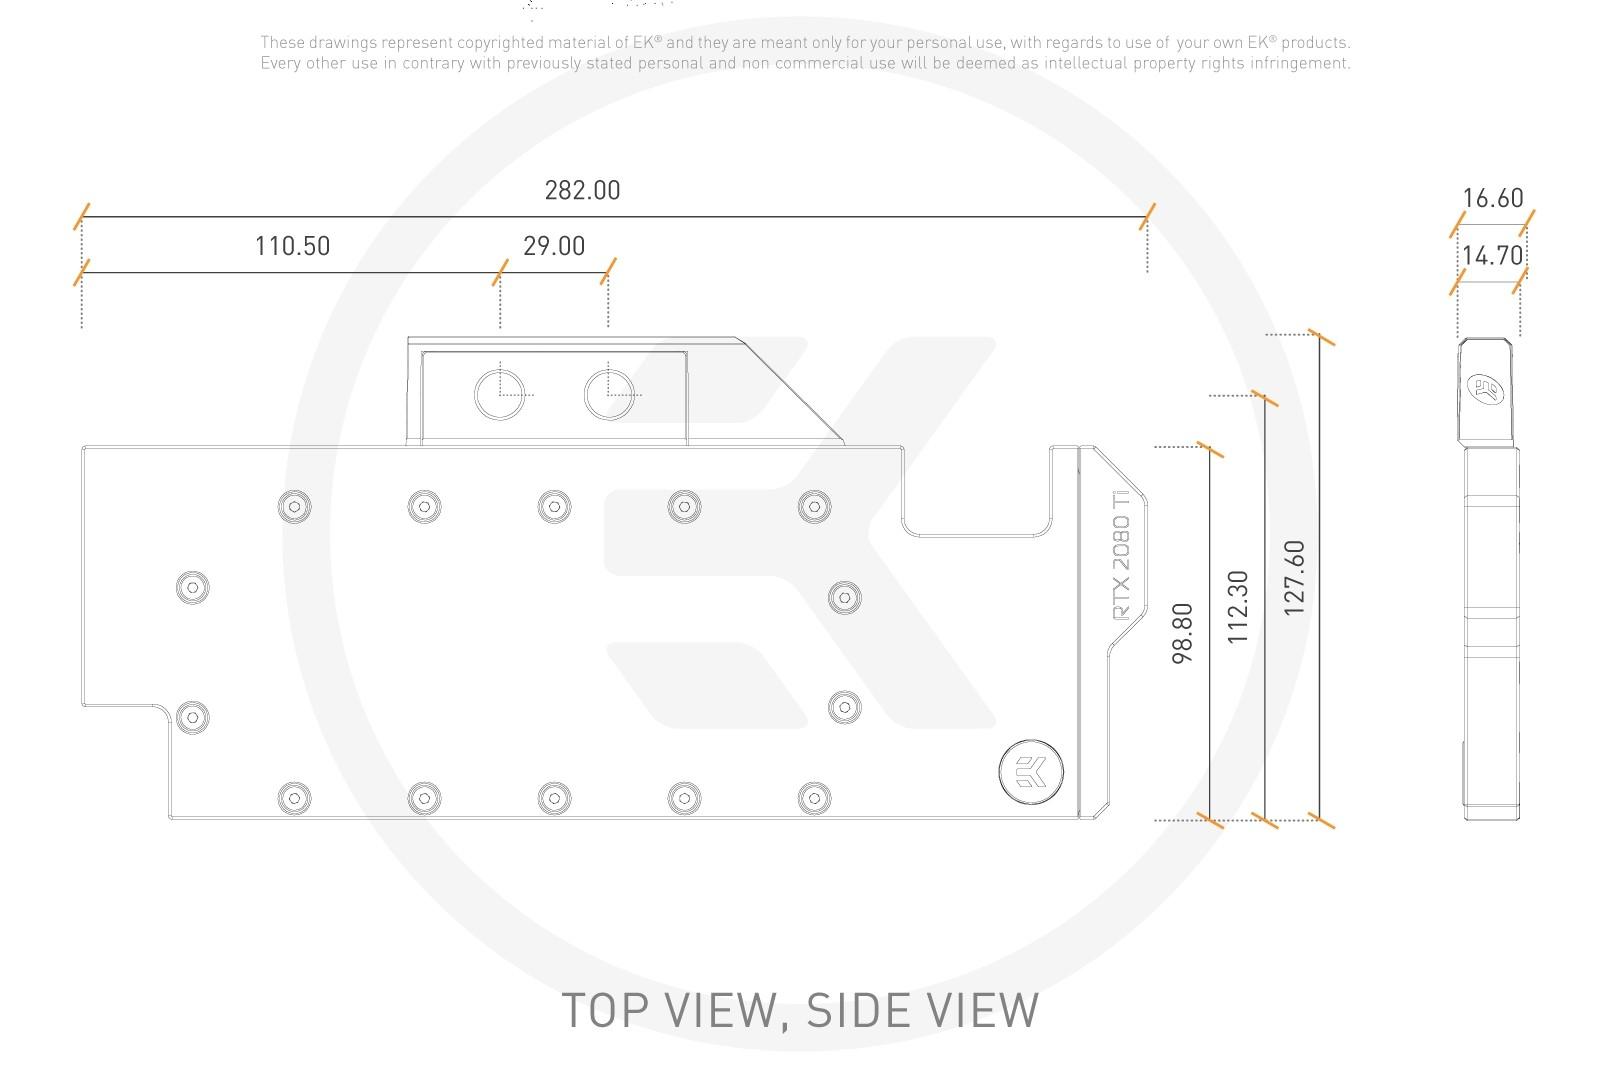 EK Vector RTX 2080 Ti - Copper + Plexi GPU Water Block